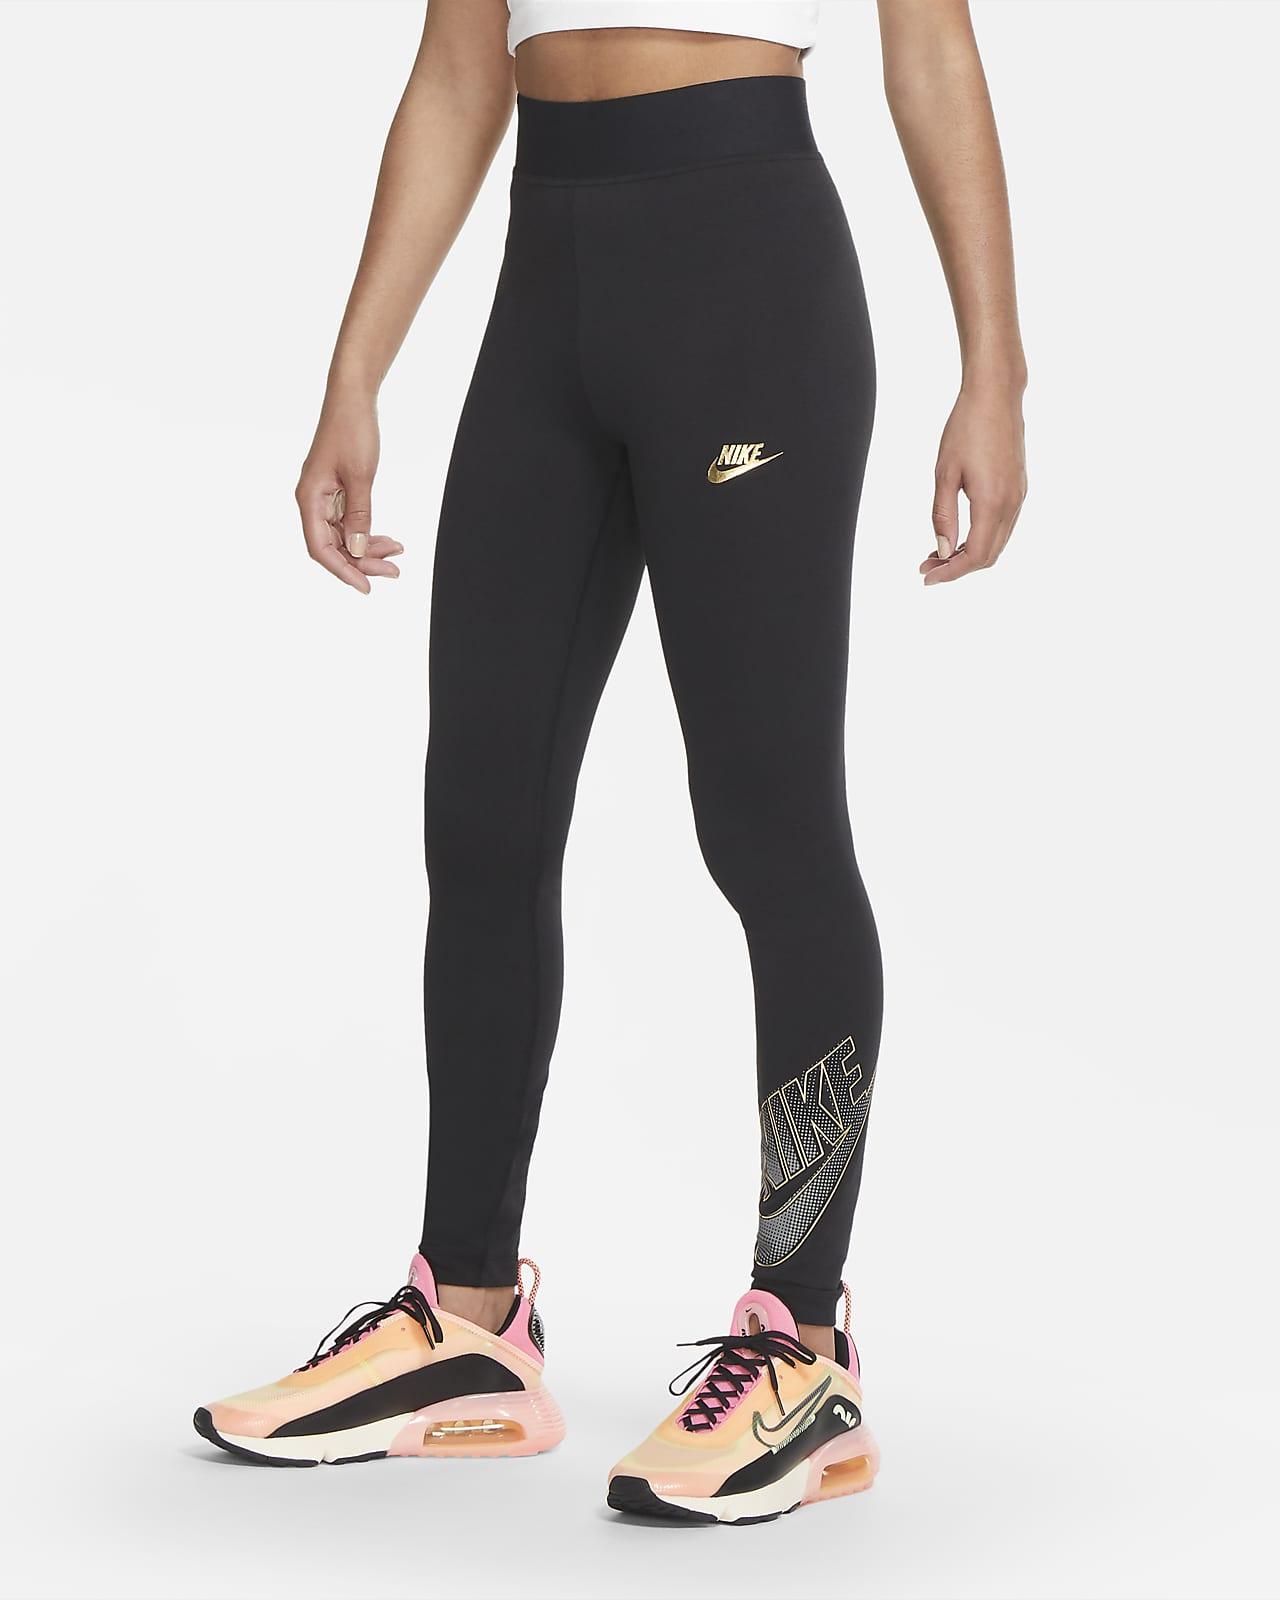 Nike Sportswear Club-leggings med høj talje til kvinder